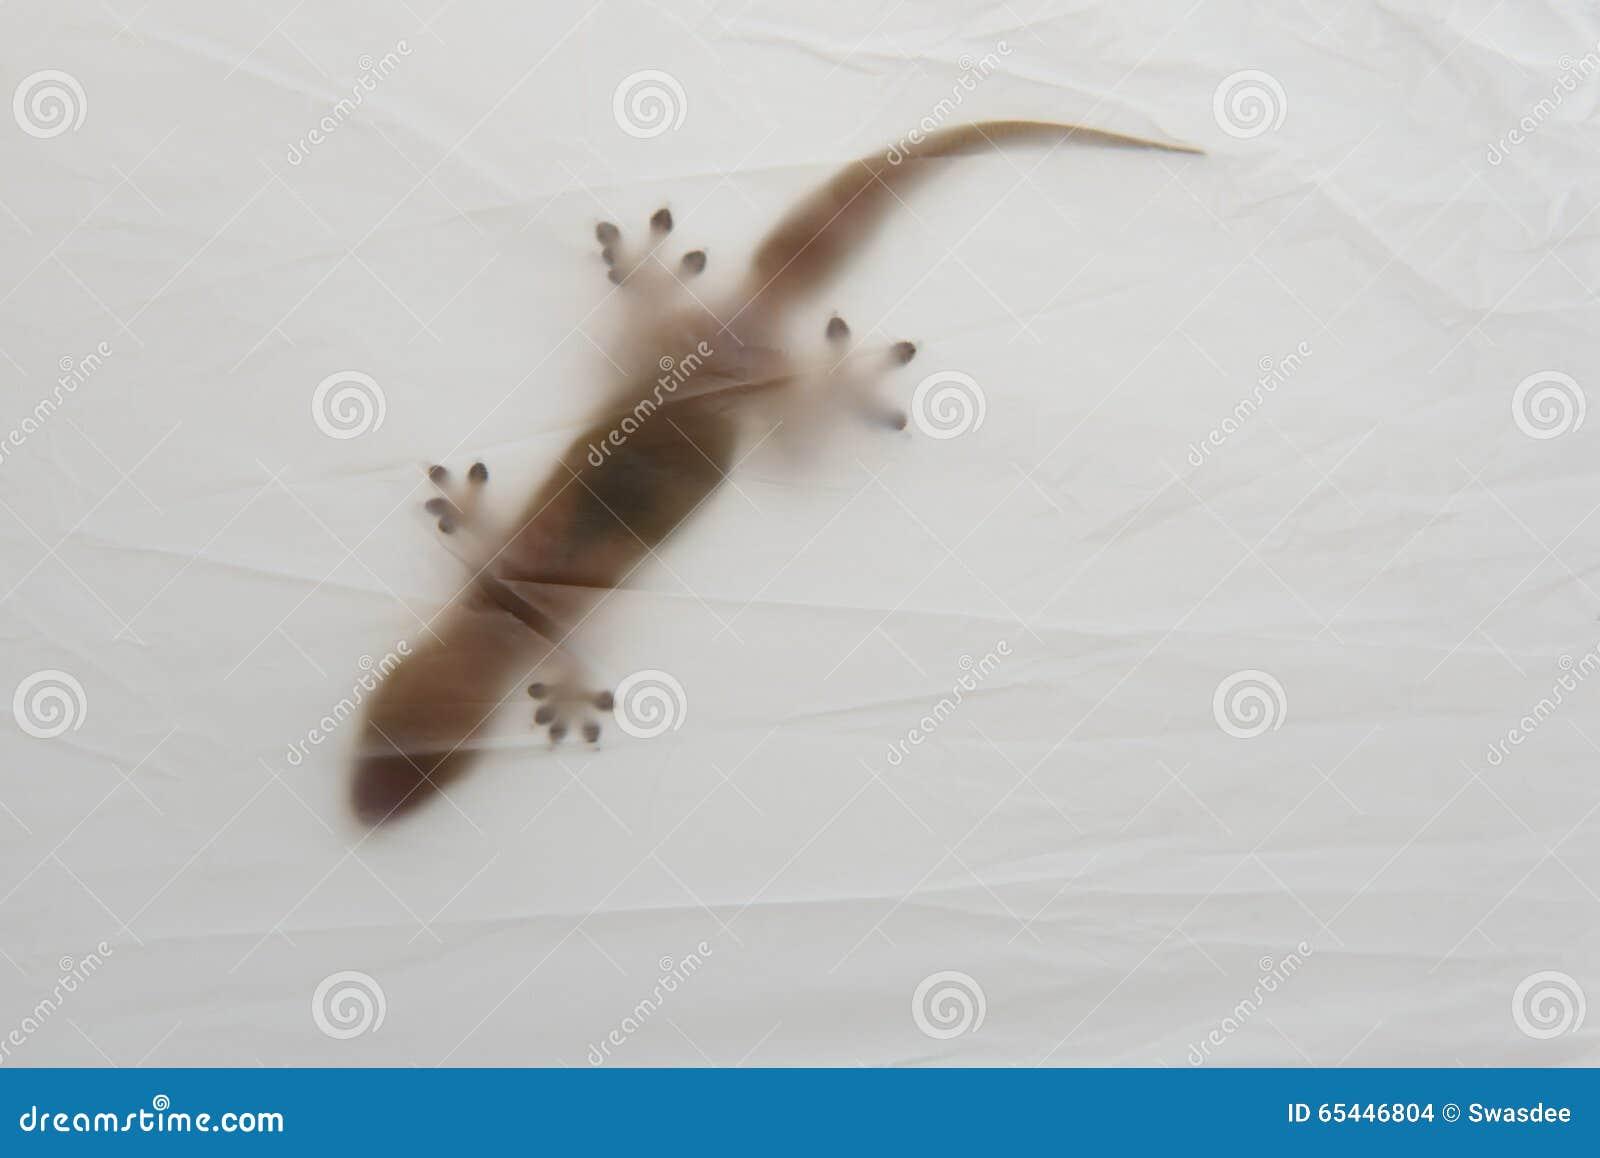 blurry house gecko. stock photo - image: 65446804